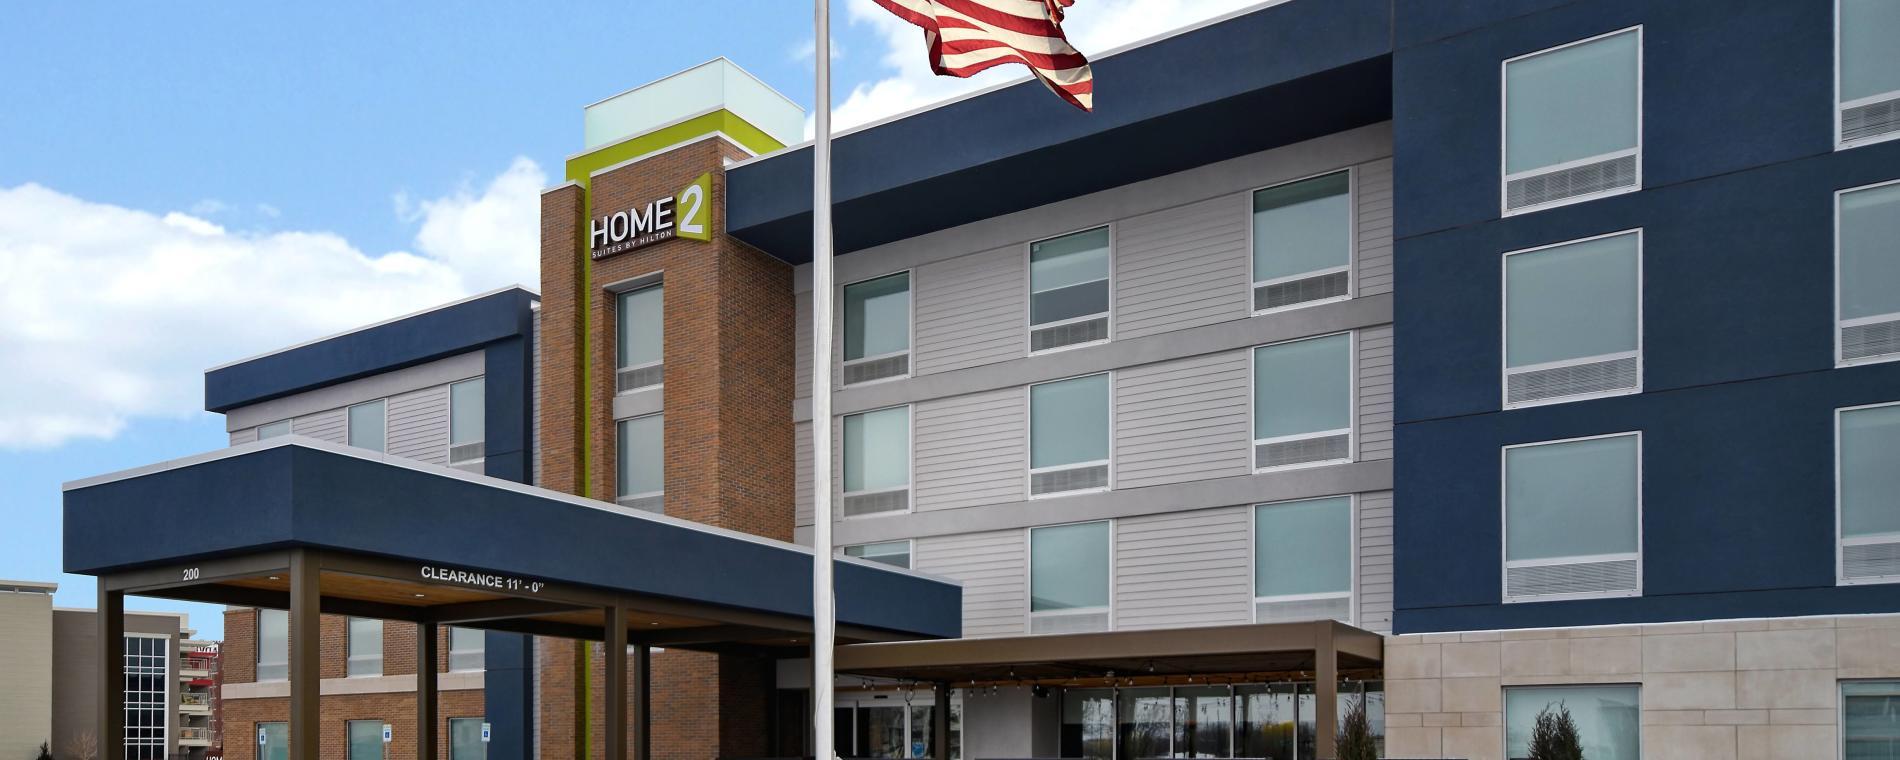 Exterior Home2 Suites by Hilton Downtown Delano